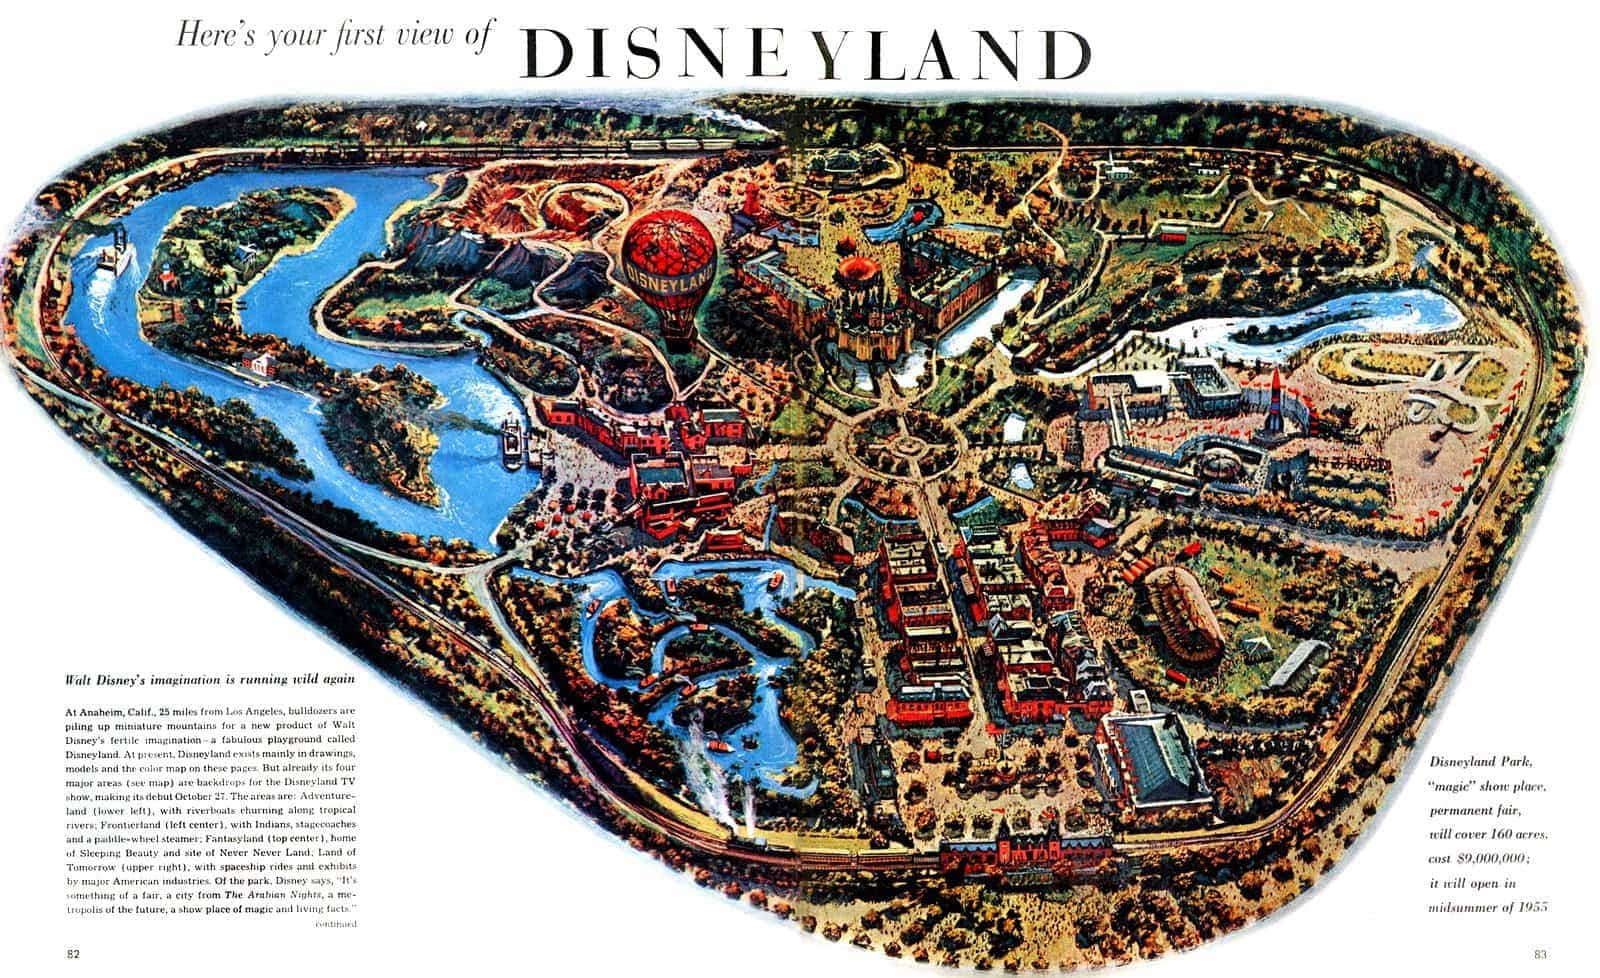 Vintage Disneyland souvenir map from 1955